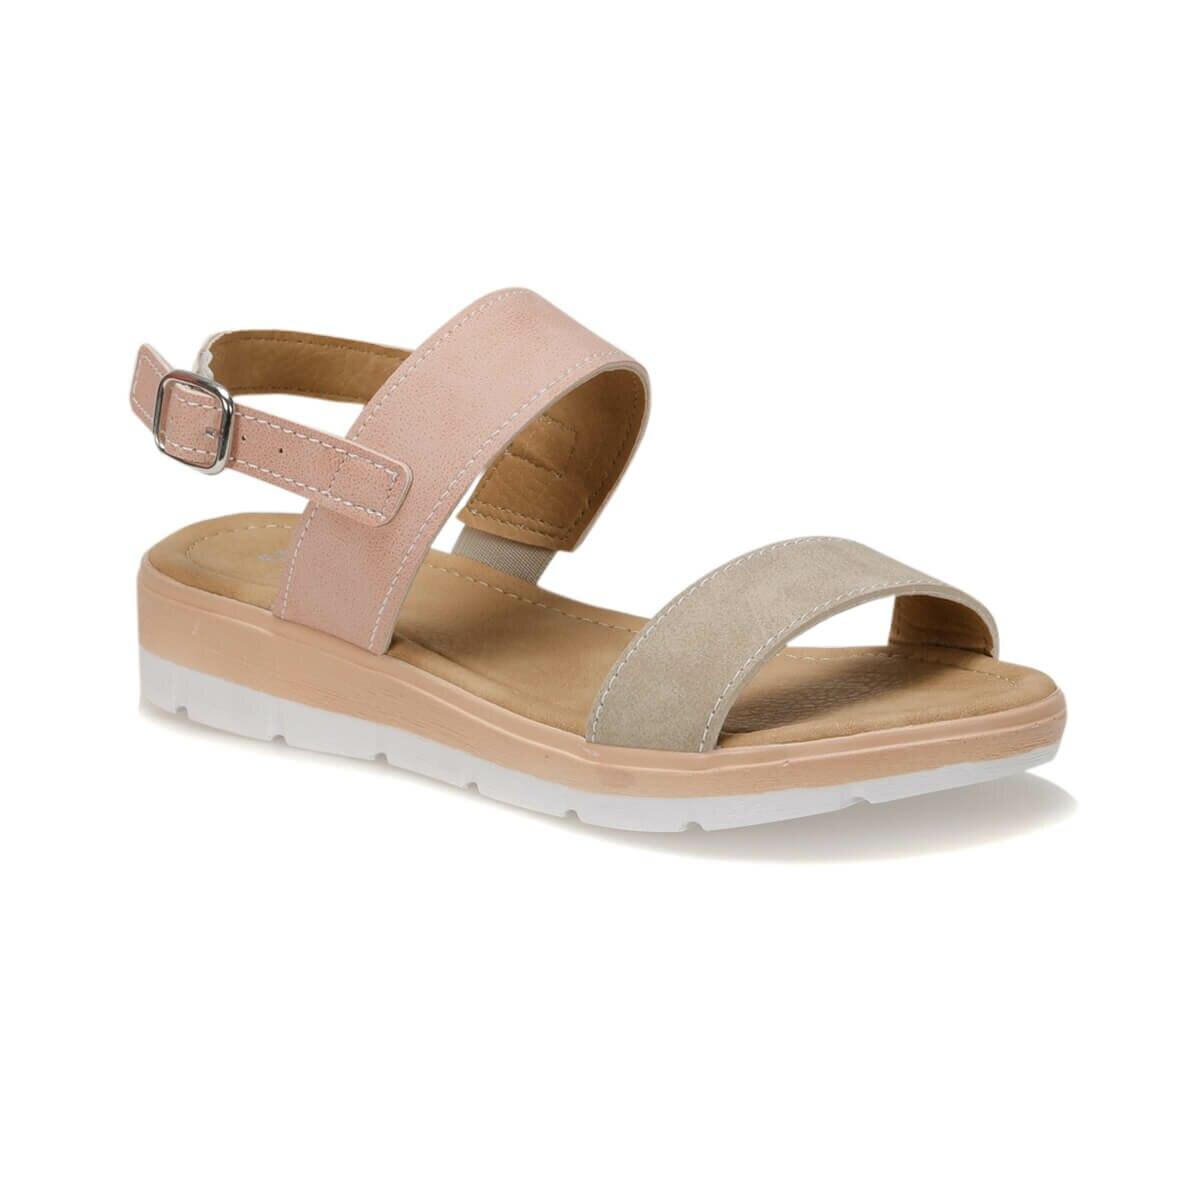 FLO 91.157385.Z Powder Women 'S Sandals Polaris